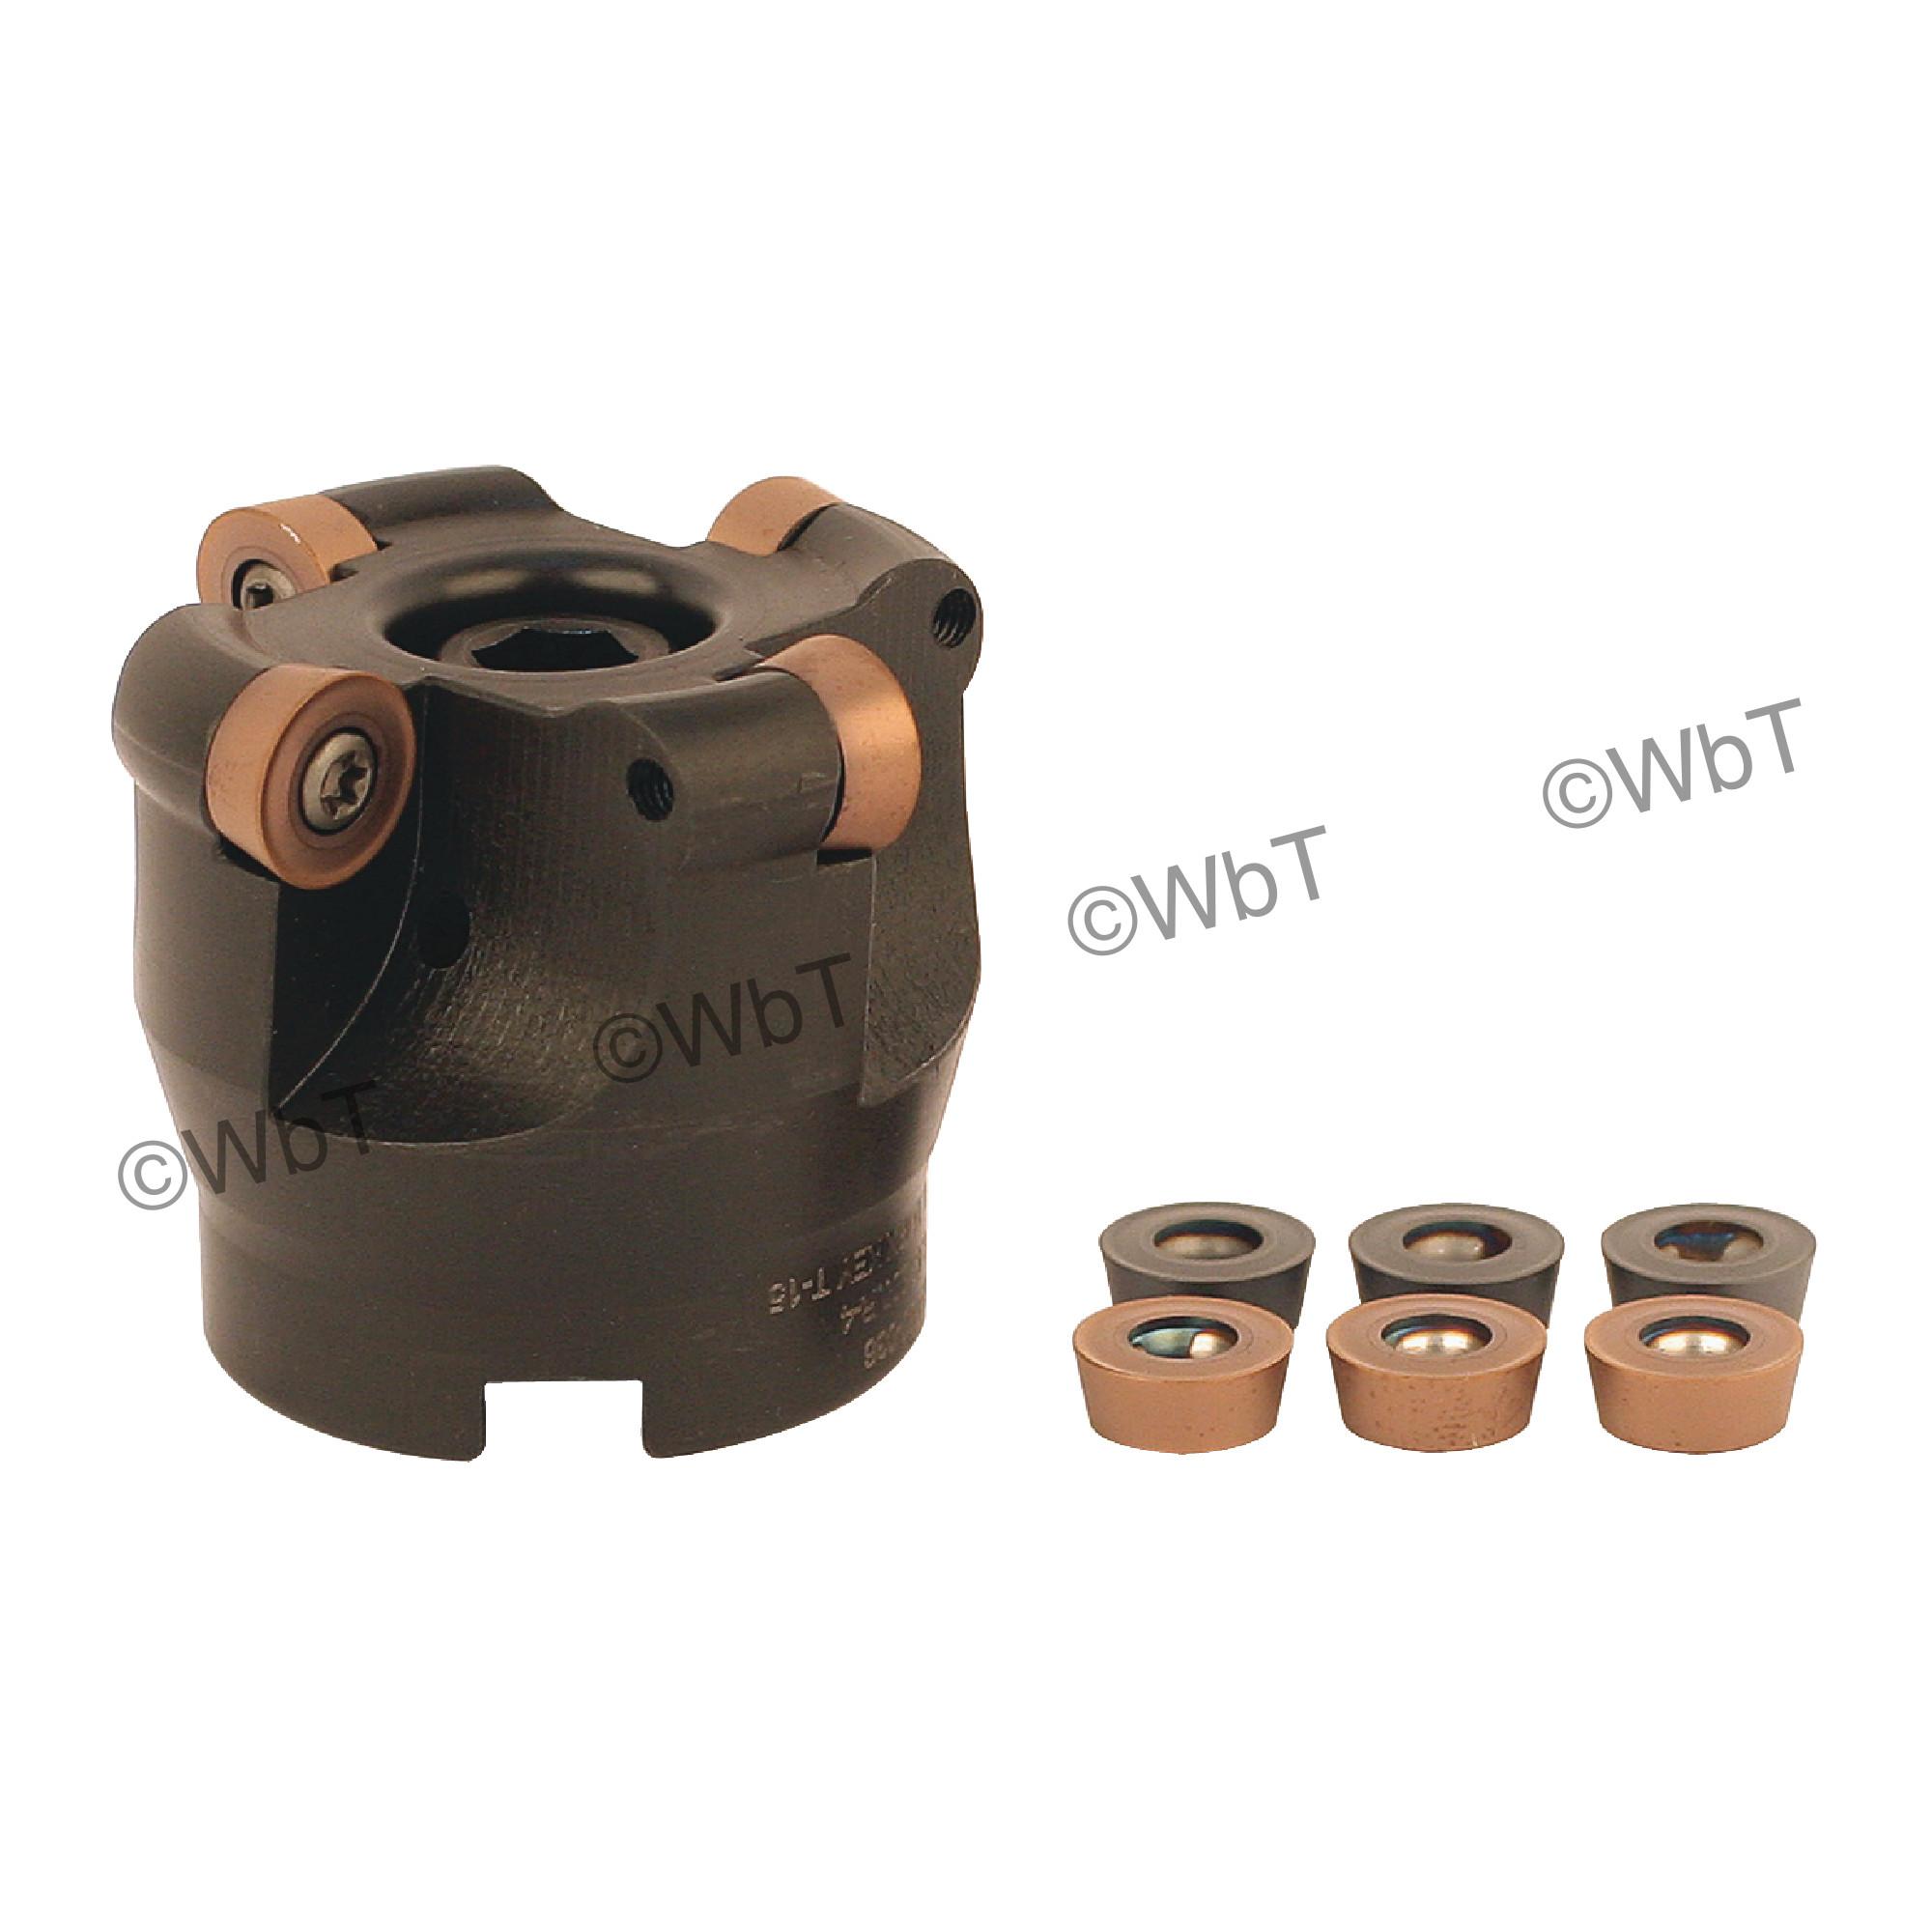 "AKUMA - 2.000"" Face Mill Set / Includes: (1) RPC.43.200R-4 (2.0""ø) & (10) RPMT1204M0S-M1 PM15M Coated Inserts / R"